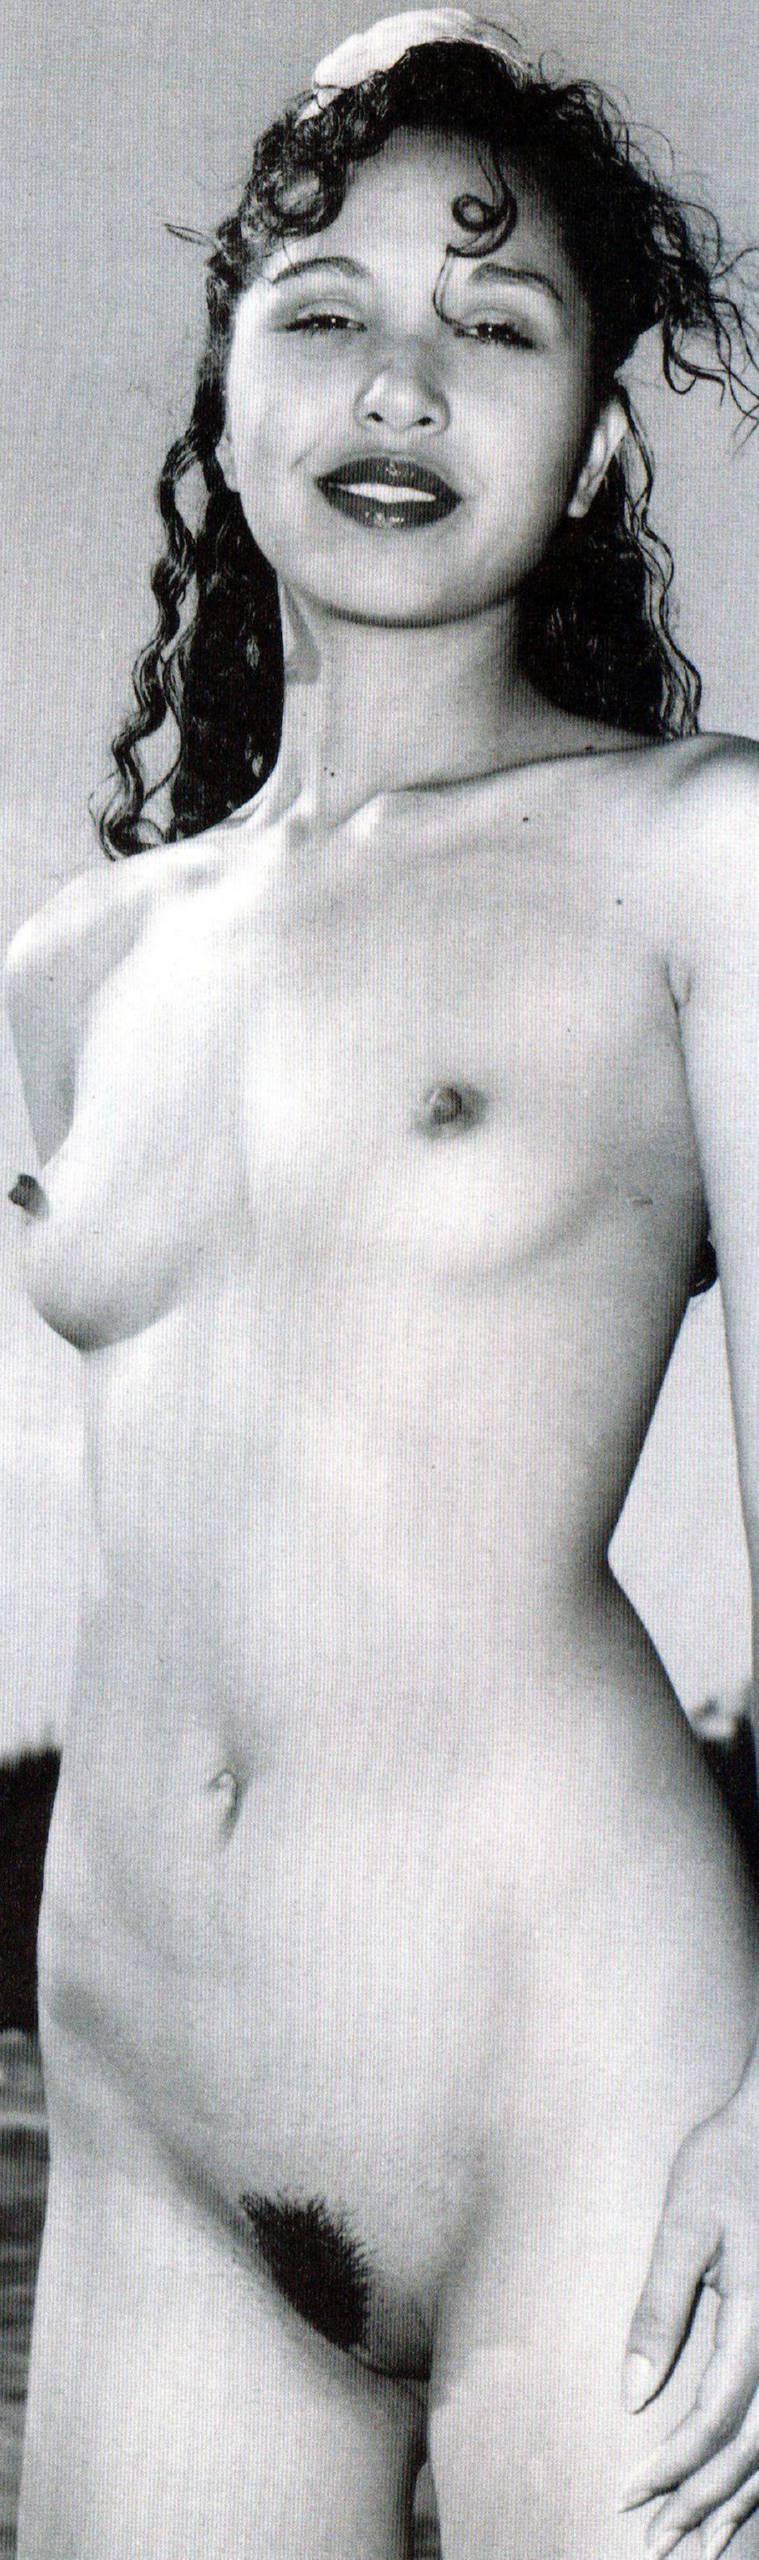 Nudist Magazines Sonnenfreunde 1995 Nr.7 - 1